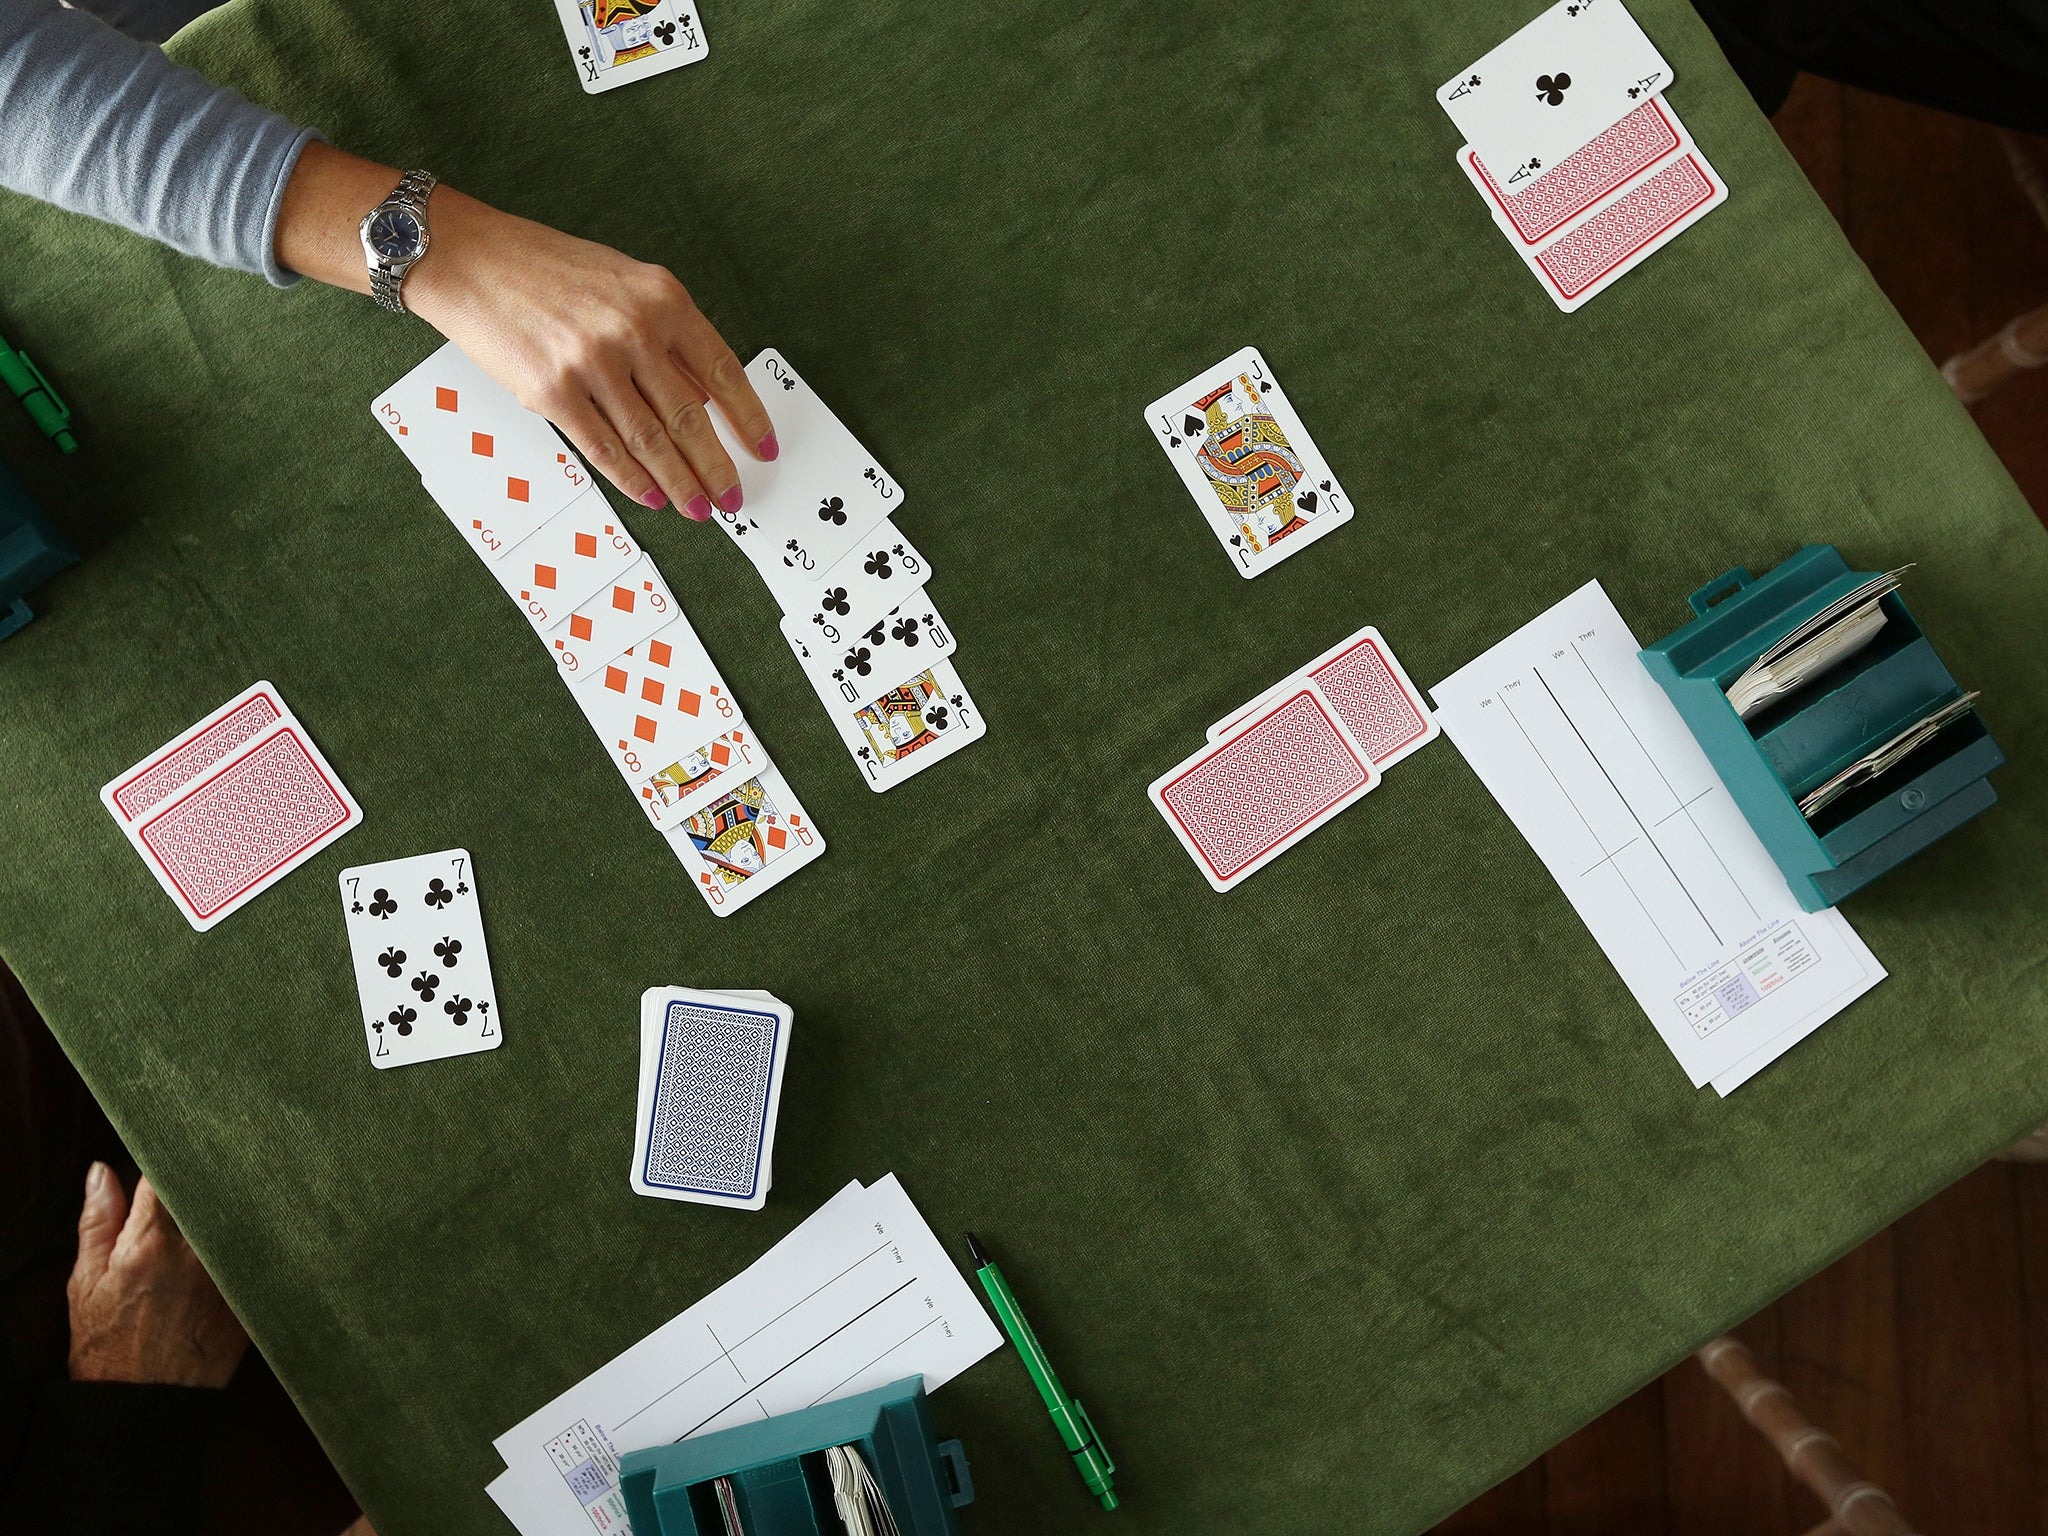 Kartenspiel FГјr 1 Person